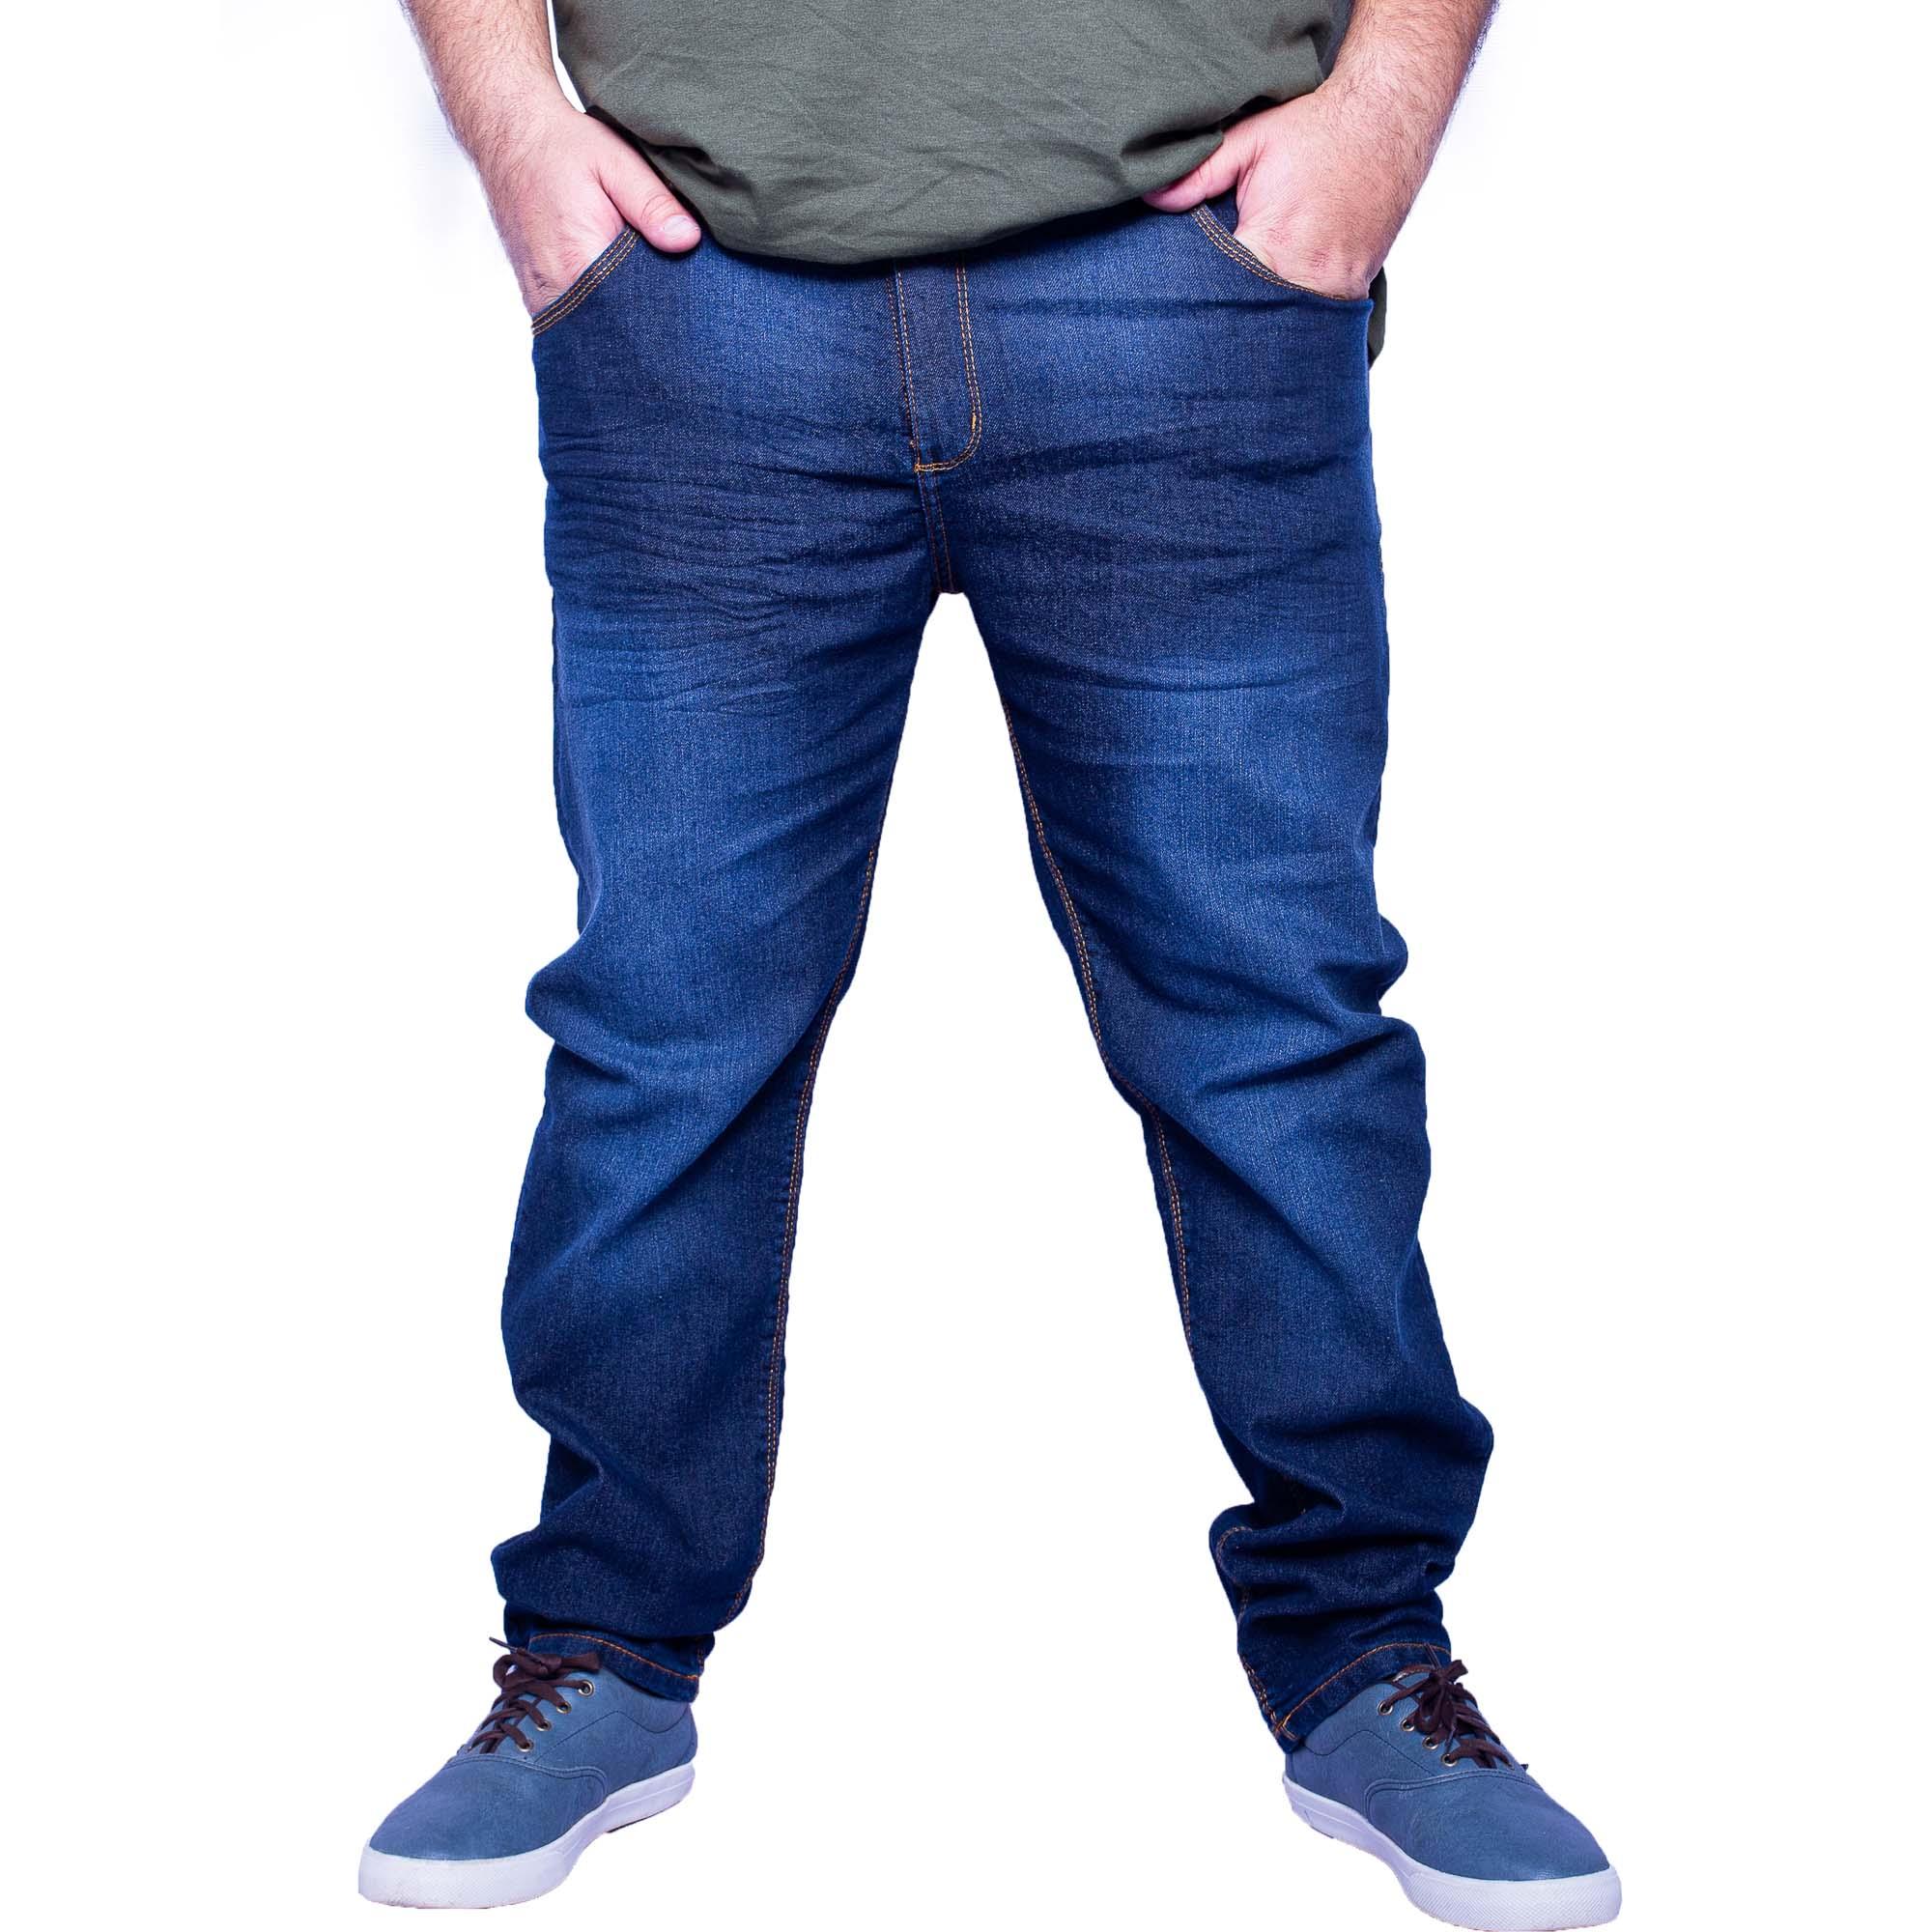 Calça Jeans Masculina Plus Size Marmorizado Escuro - Aizone